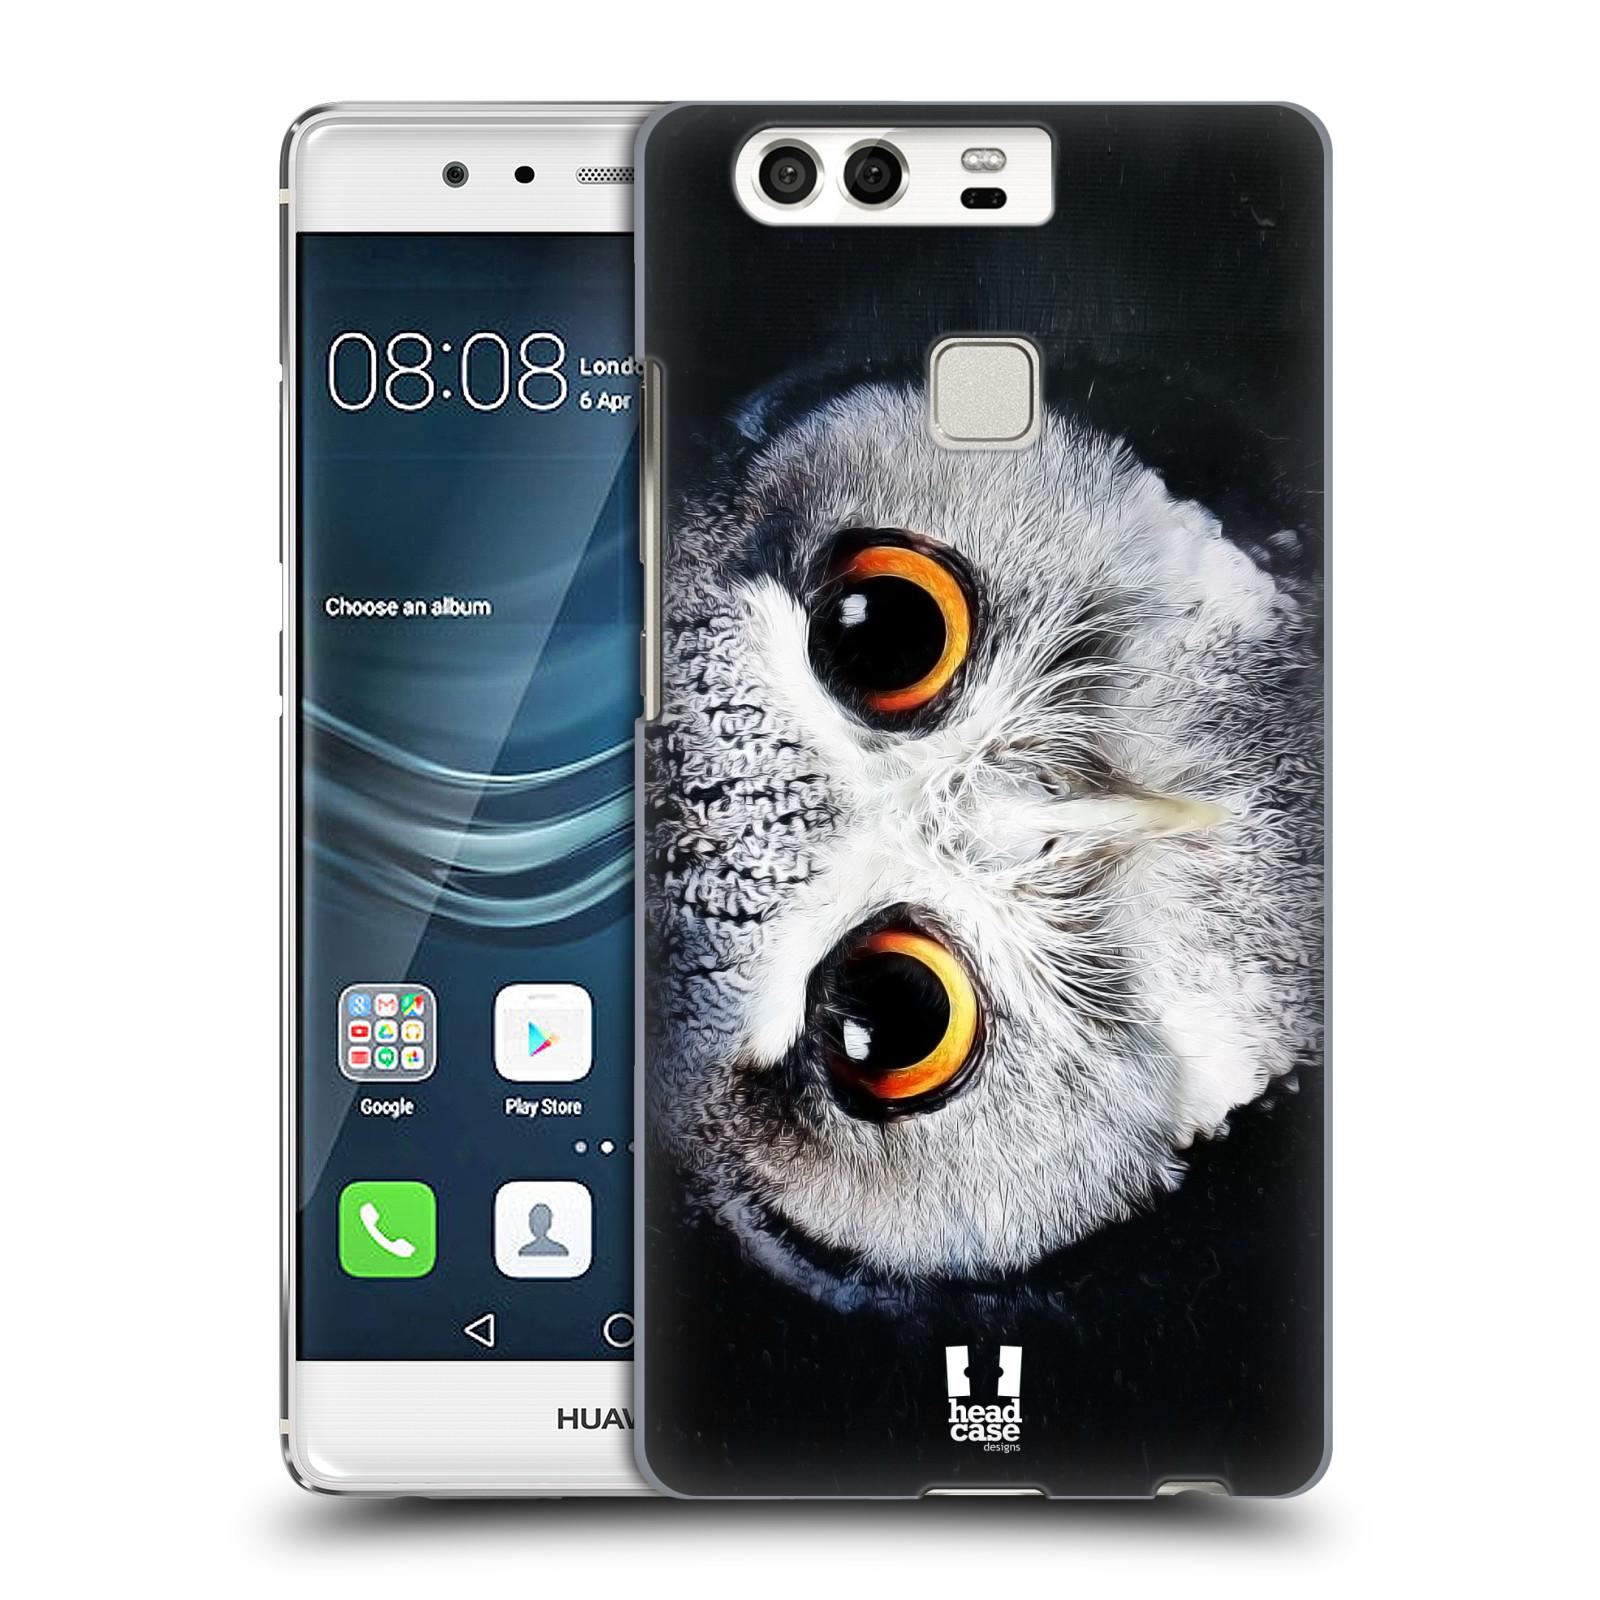 HEAD CASE plastový obal na mobil Huawei P9 / P9 DUAL SIM vzor Zvířecí tváře sova